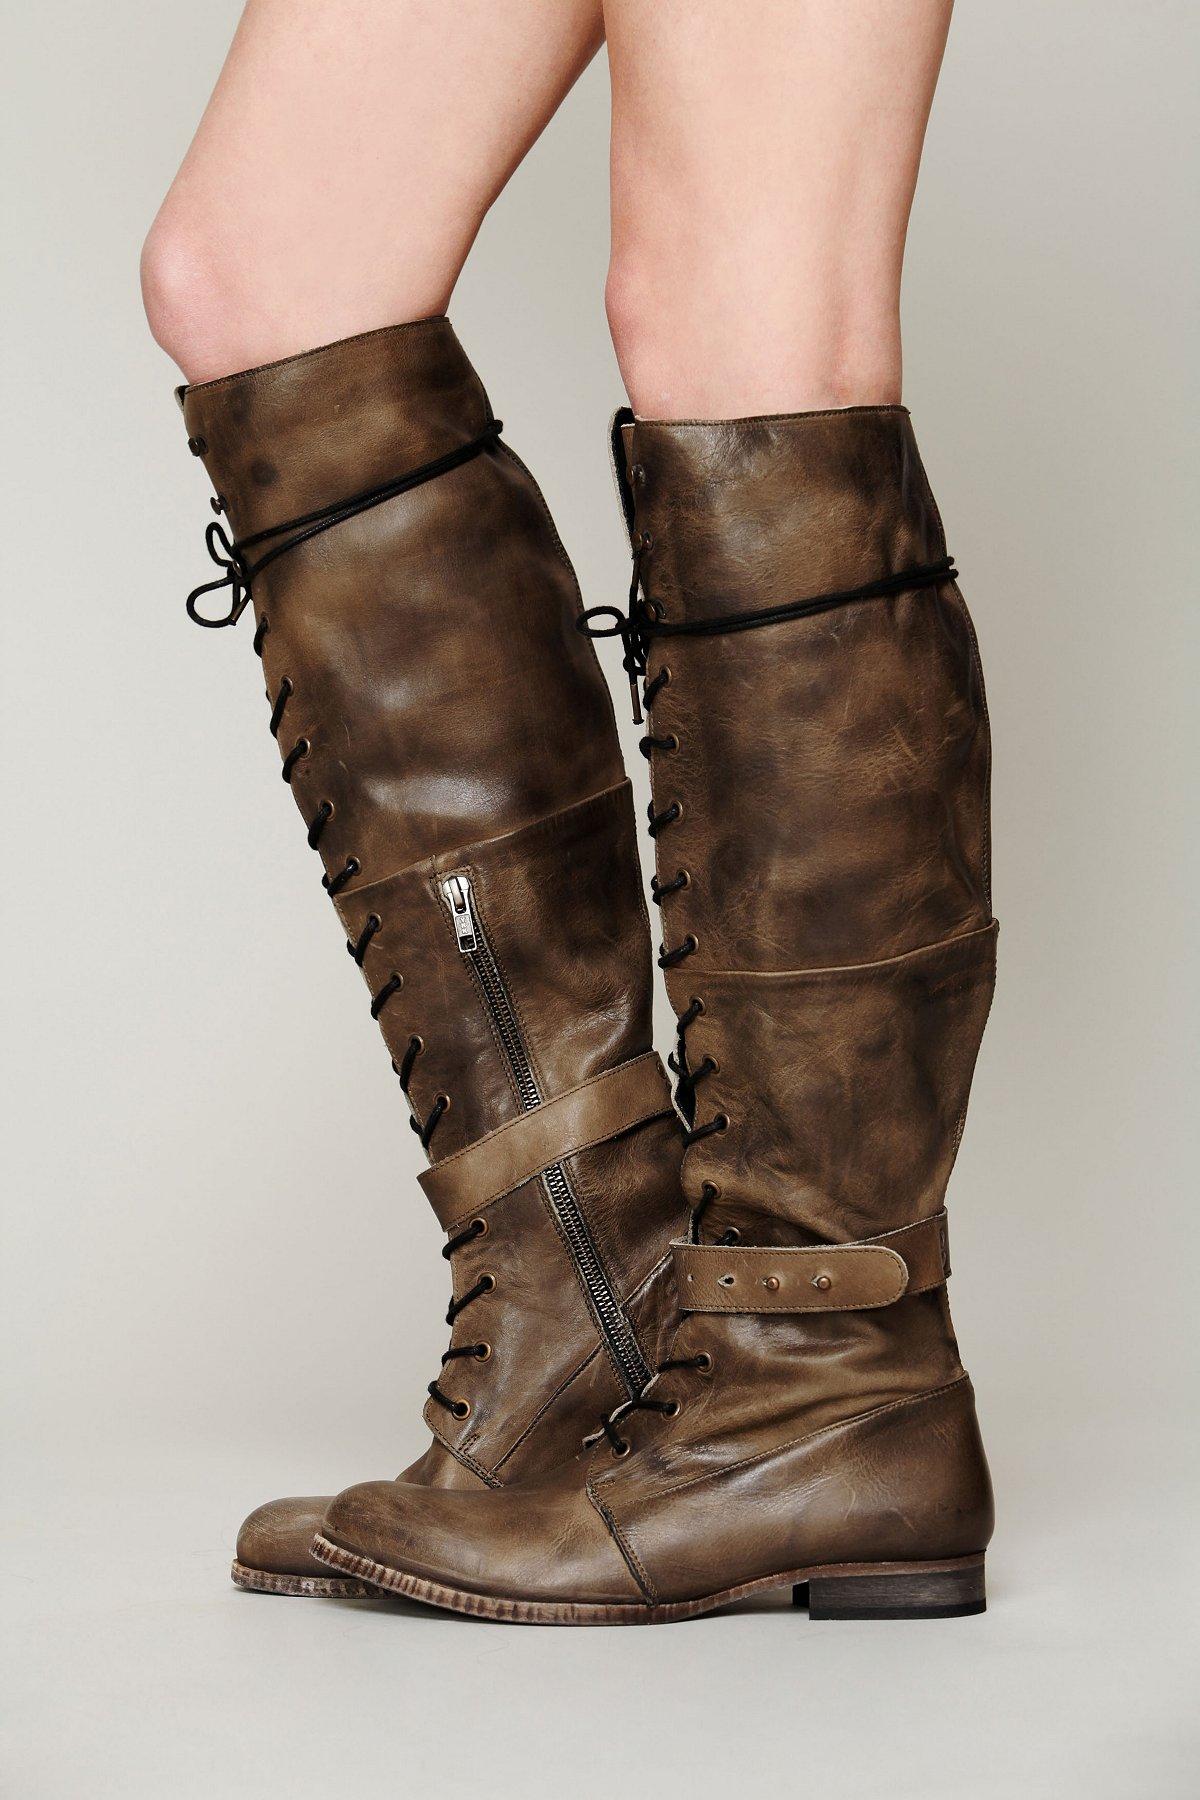 Landmark Lace Up Boot